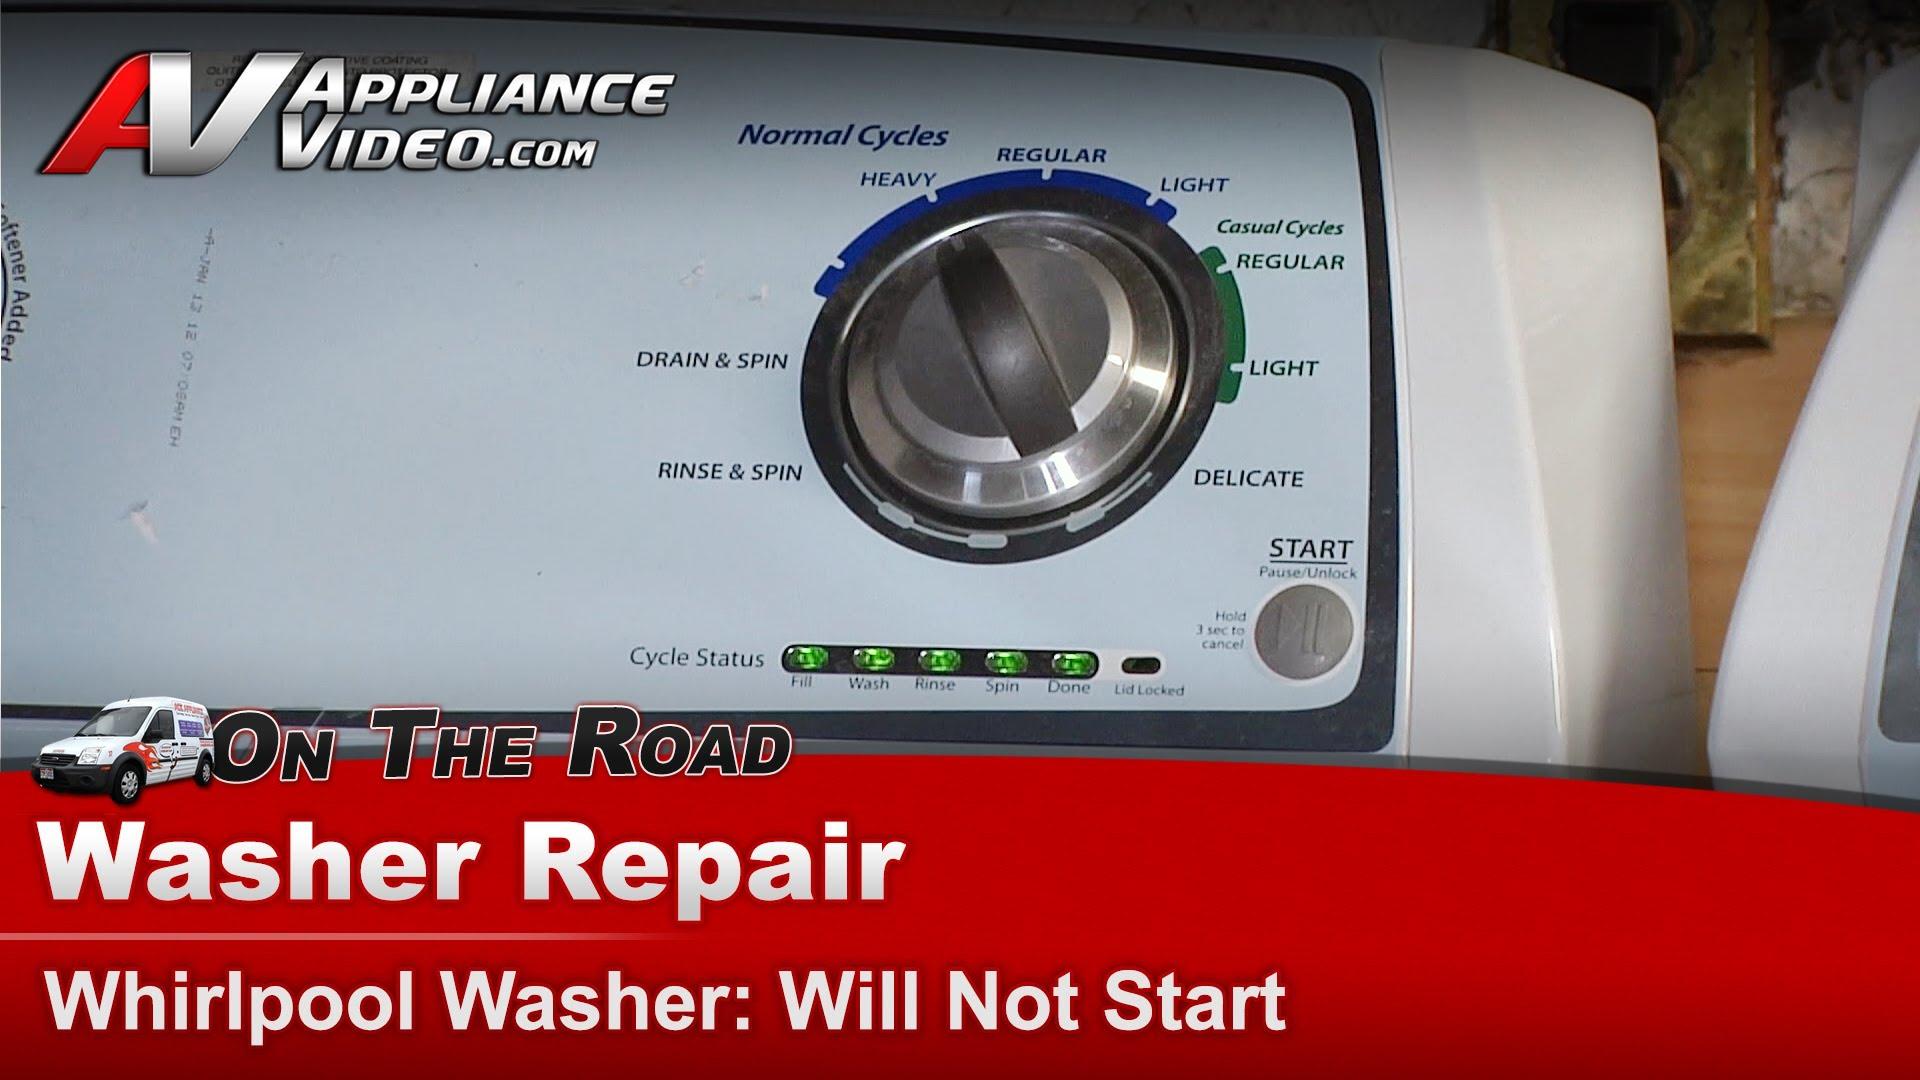 Whirlpool Wtw4800xq2 Washer Repair Does Not Start